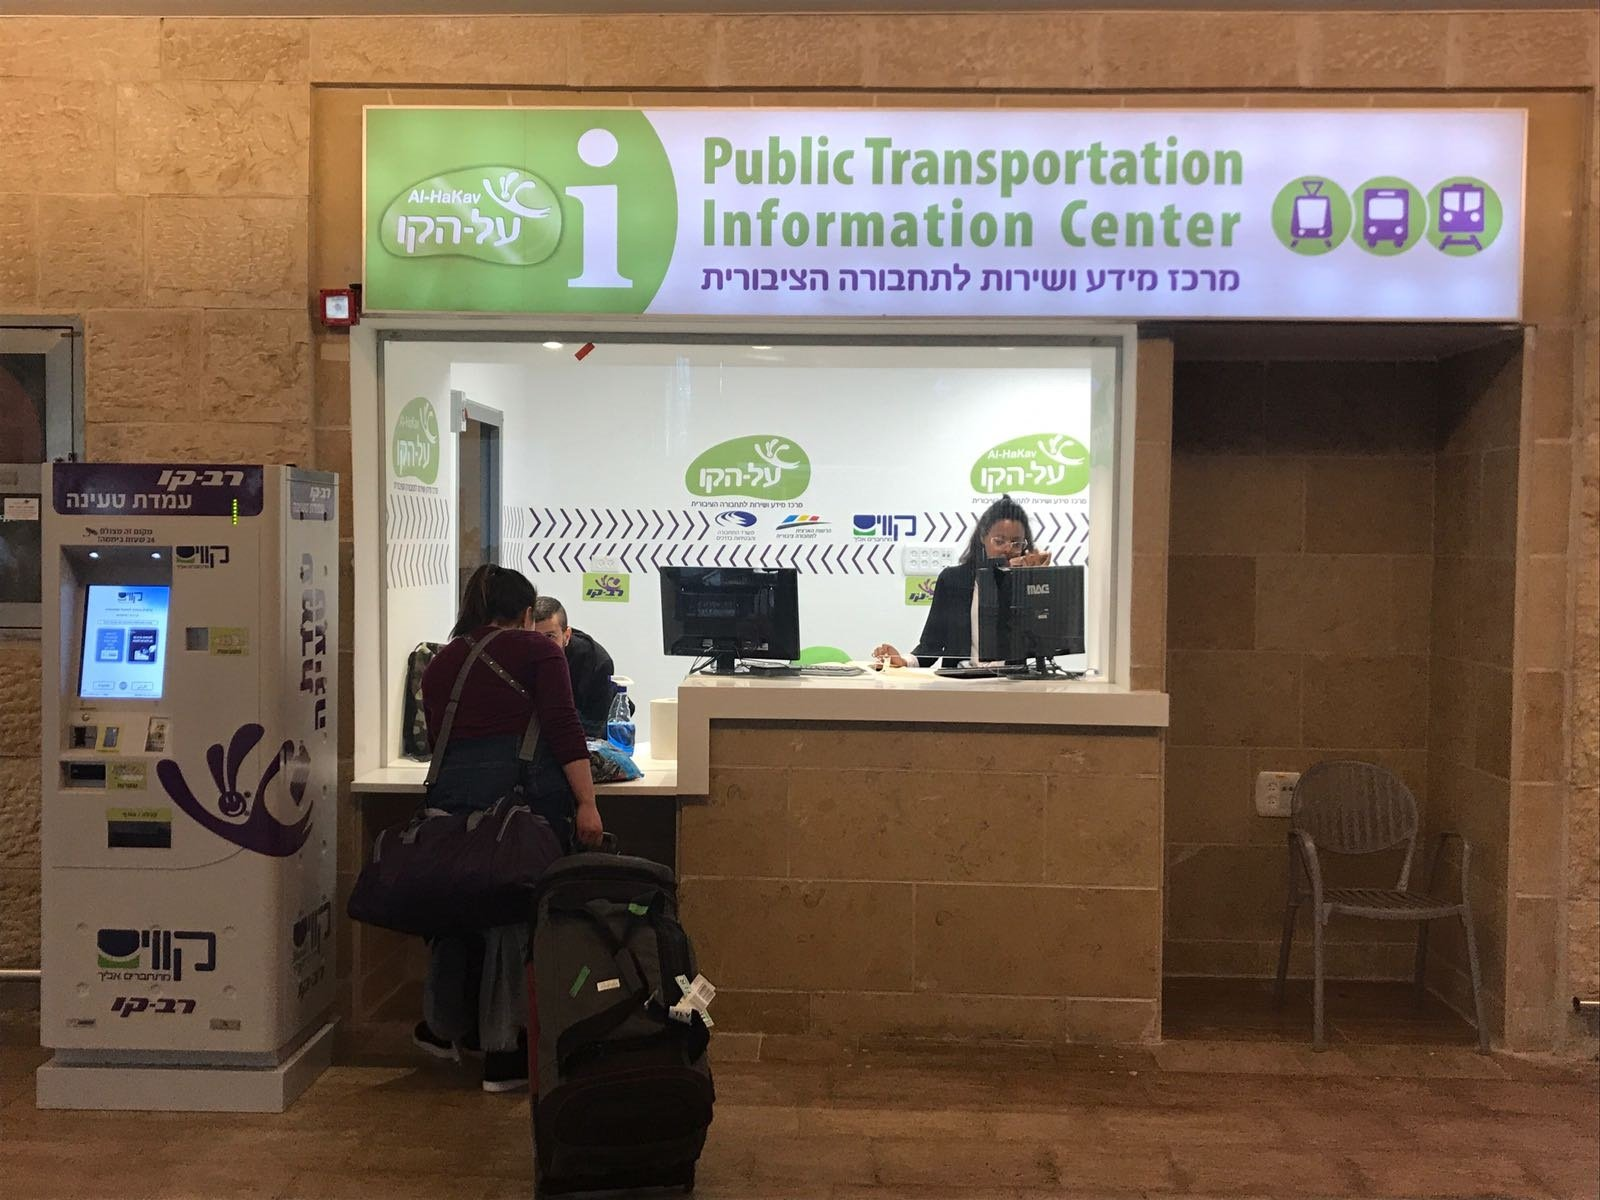 Ben Gurion airport tourist information center